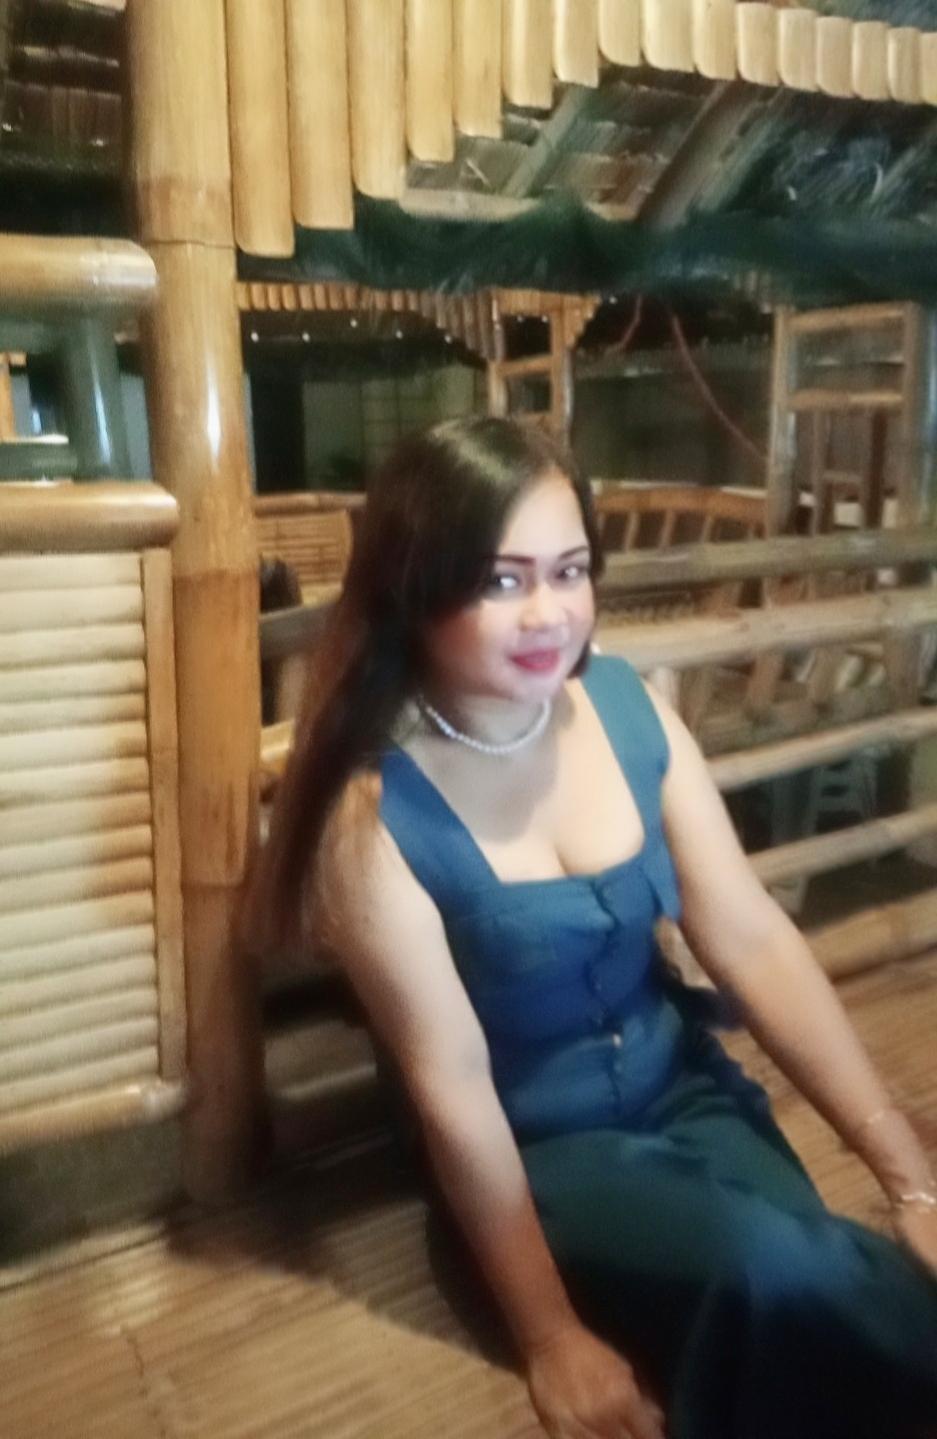 BeautyPlus_20210201013706875_save.jpg